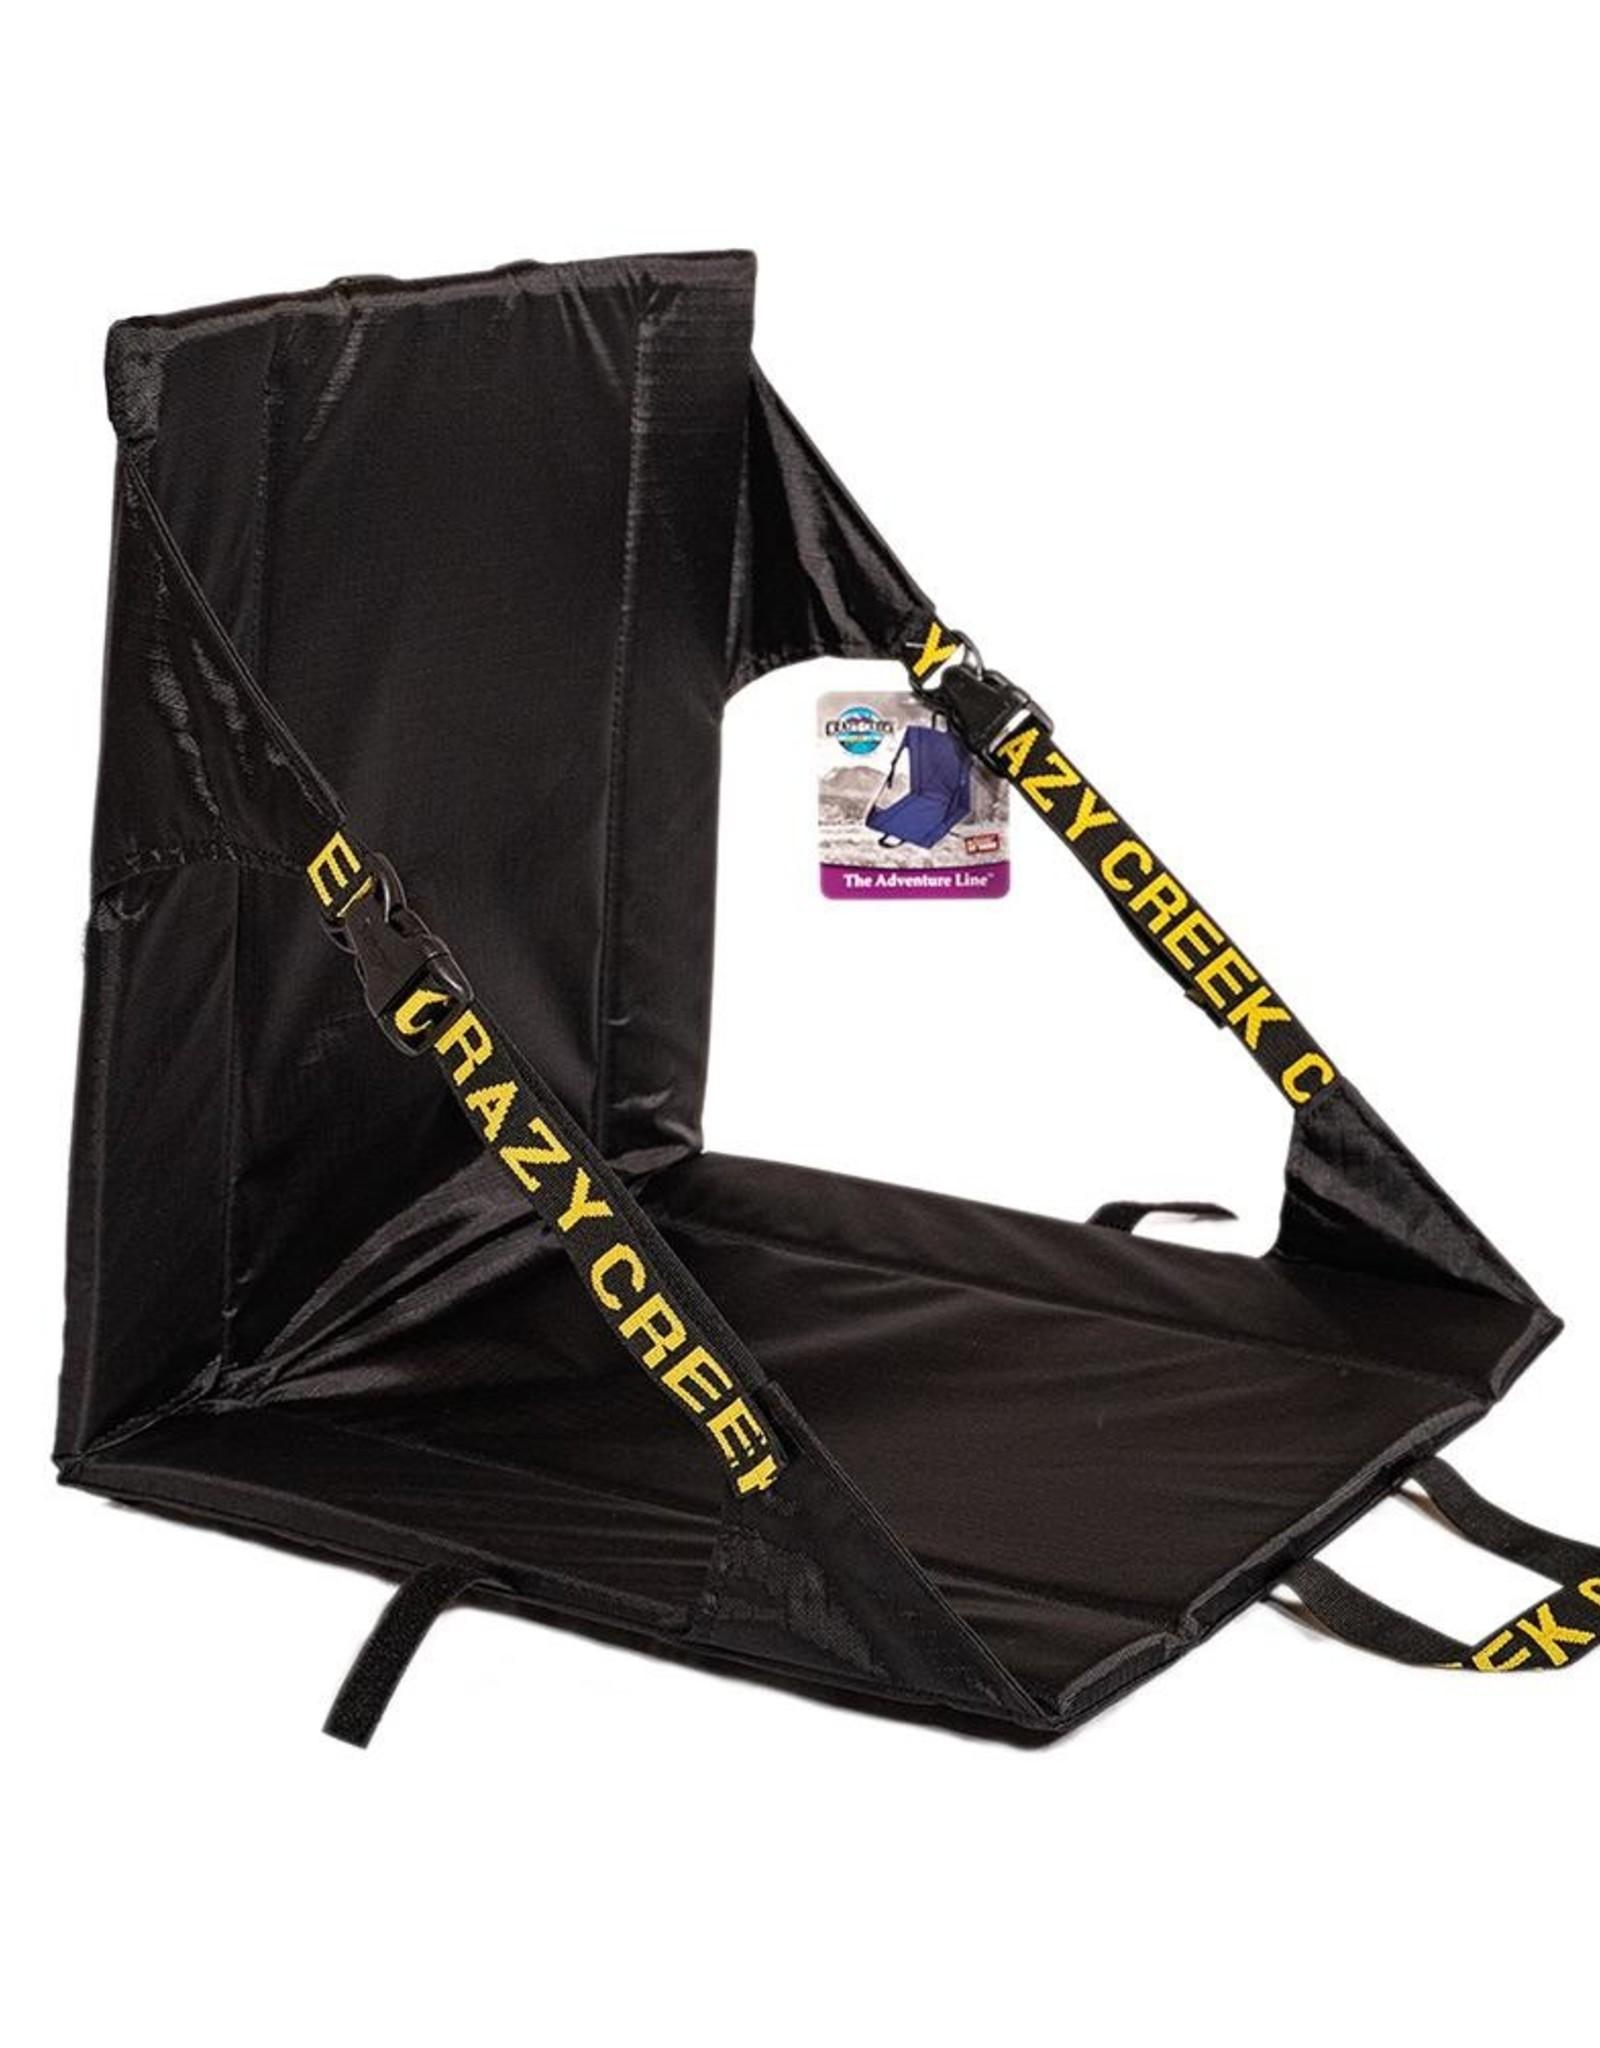 Crazy Creek Original Chair